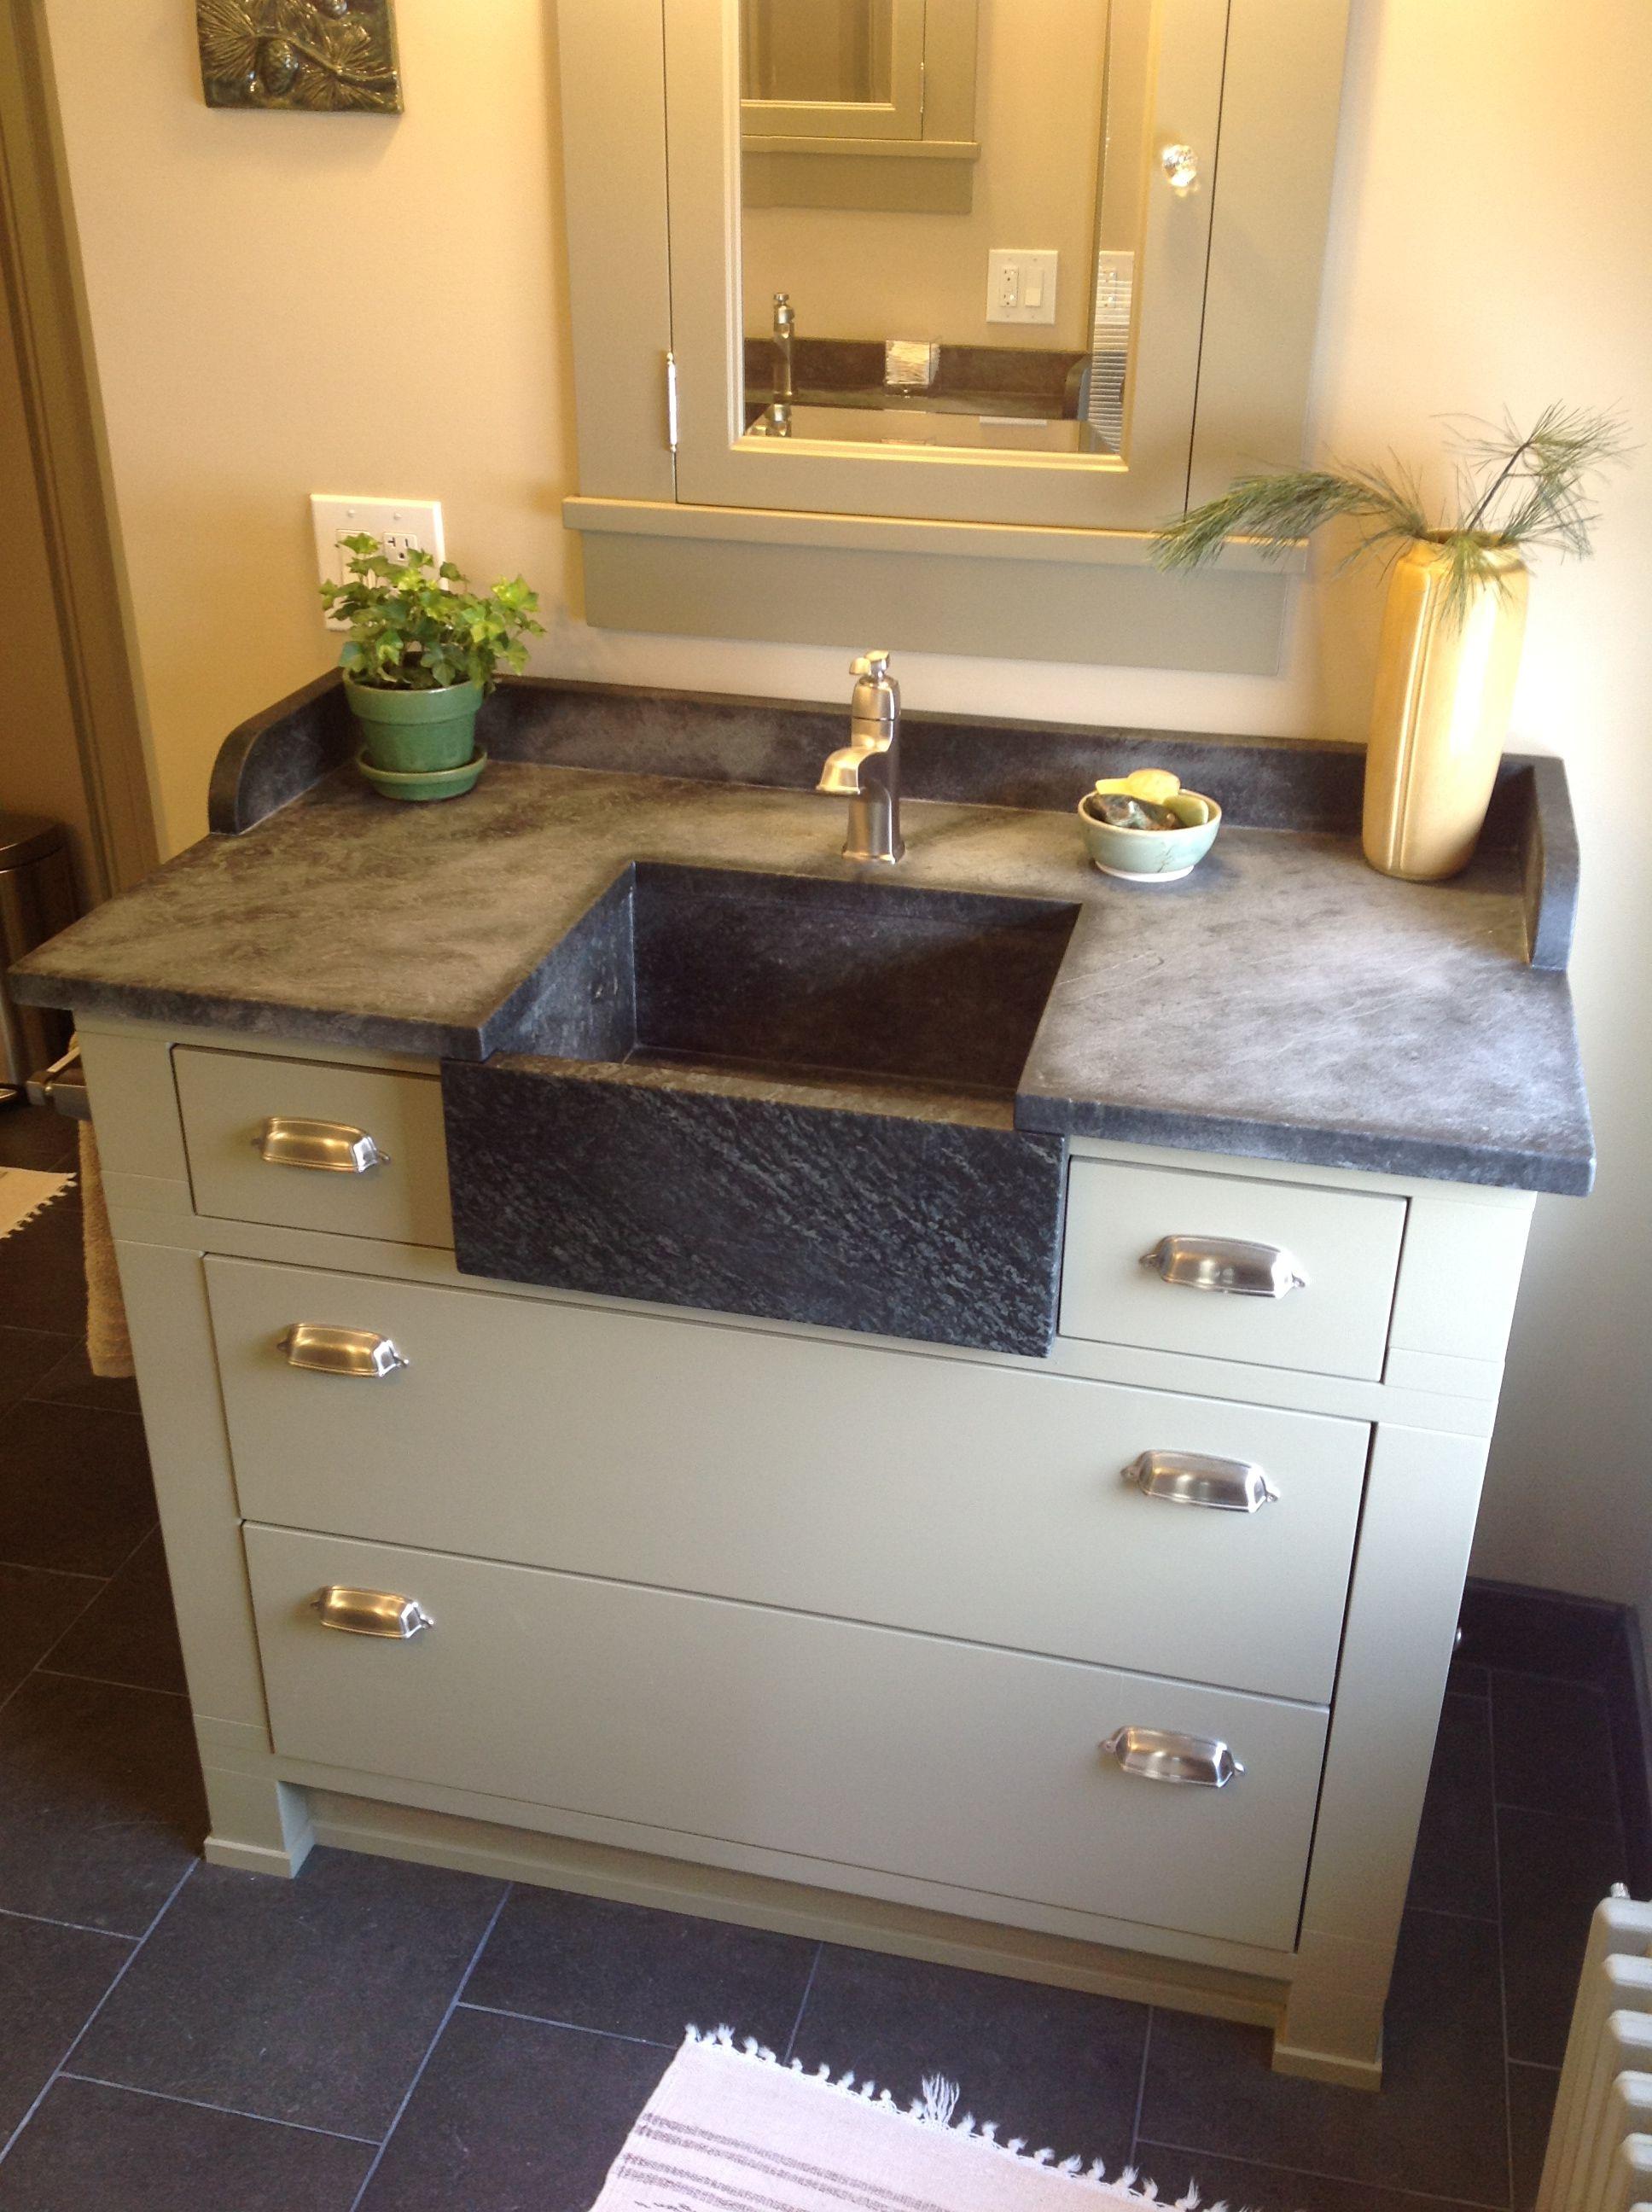 Pin By Melora Lustig On Bathrooms In 2019 Bathroom Countertops